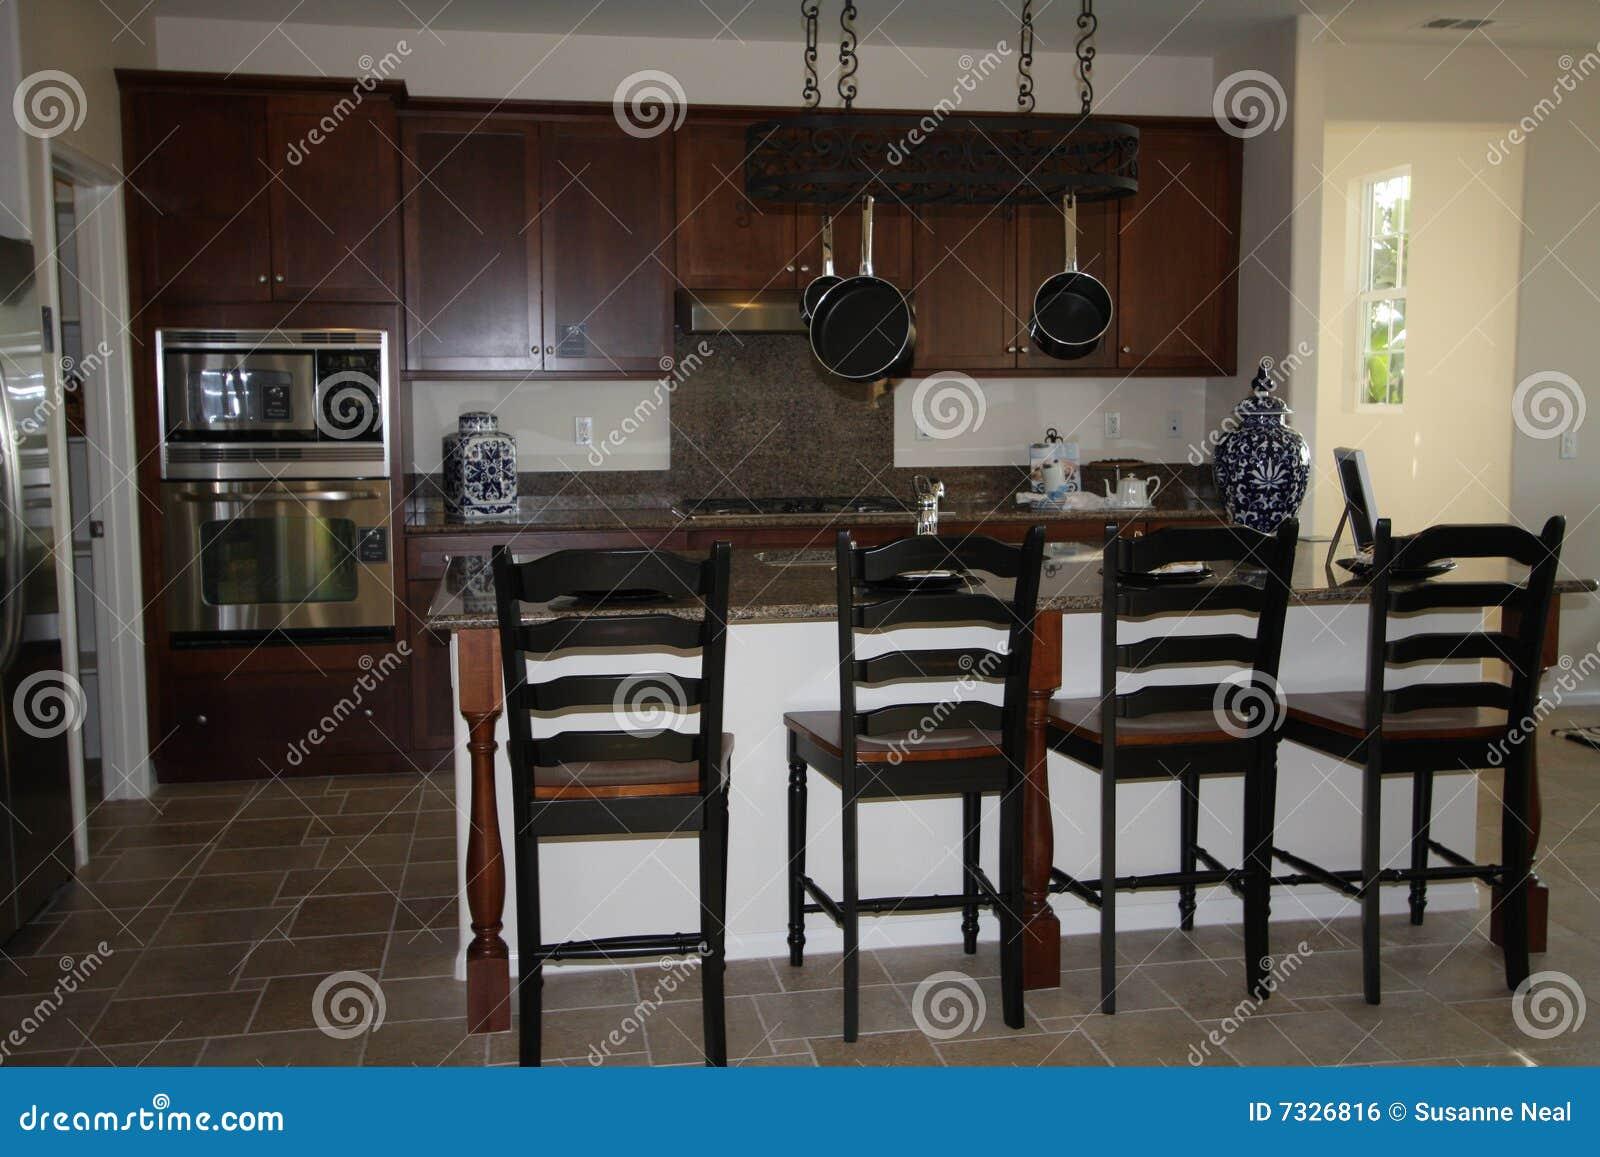 Cucina Moderna Con L'isola Immagine Stock Libera Da Diritti Immagine  #81A229 1300 957 Armadietti Da Cucina